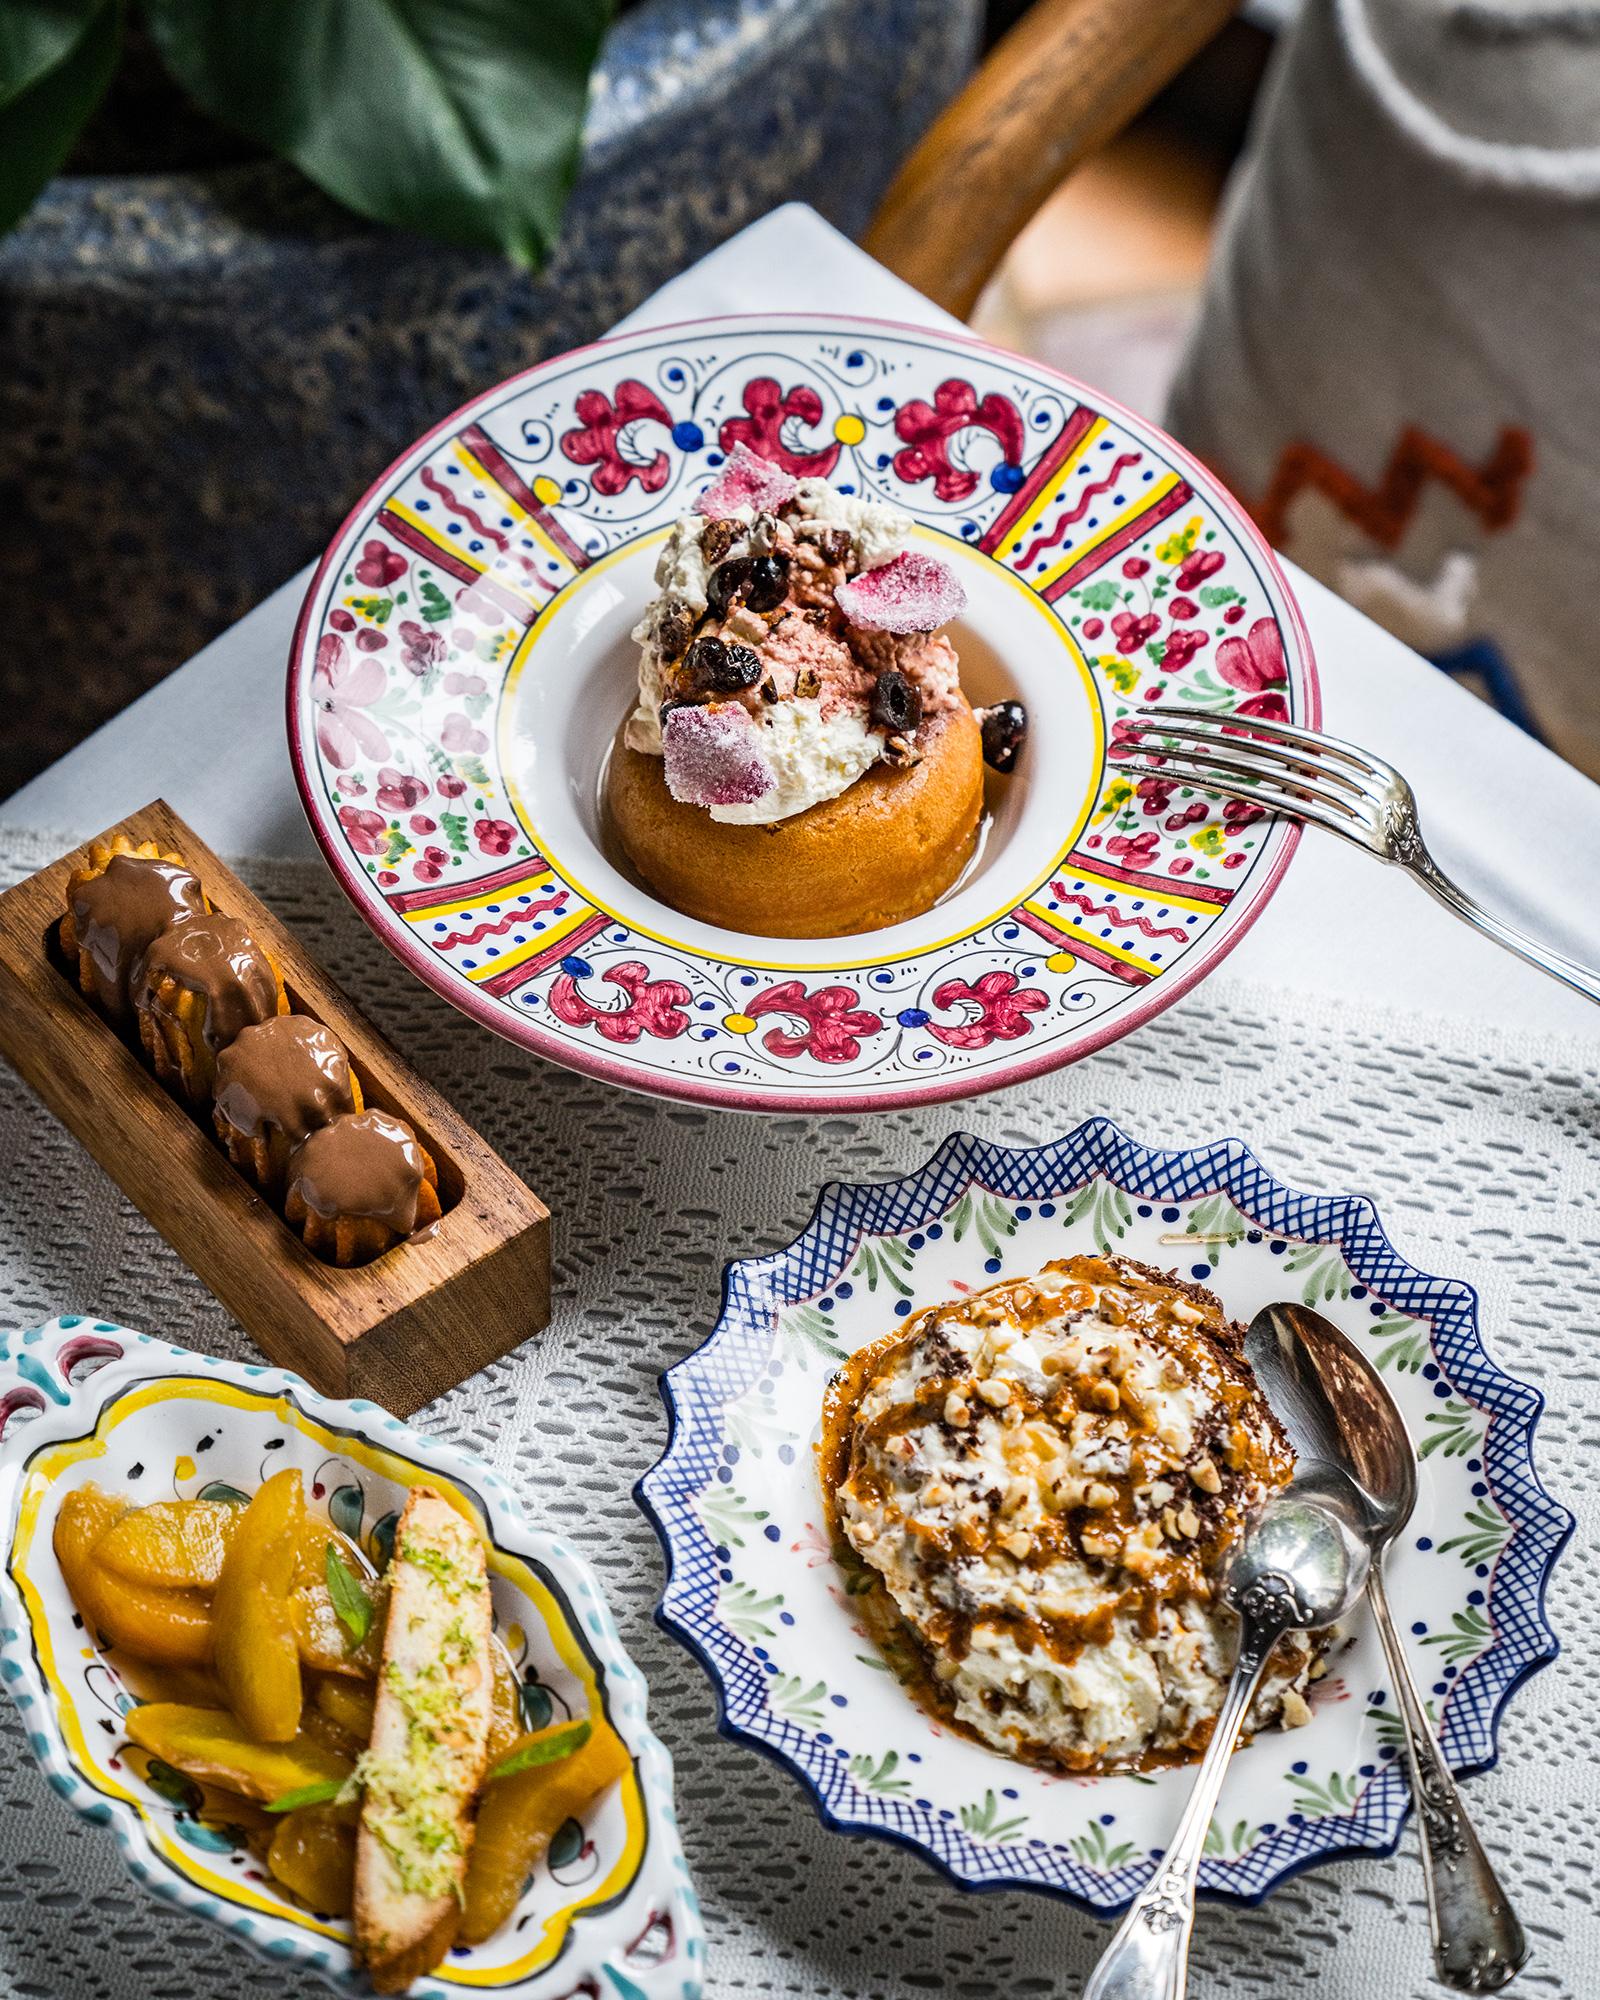 A selection of indulgent desserts at Circolo Popolare